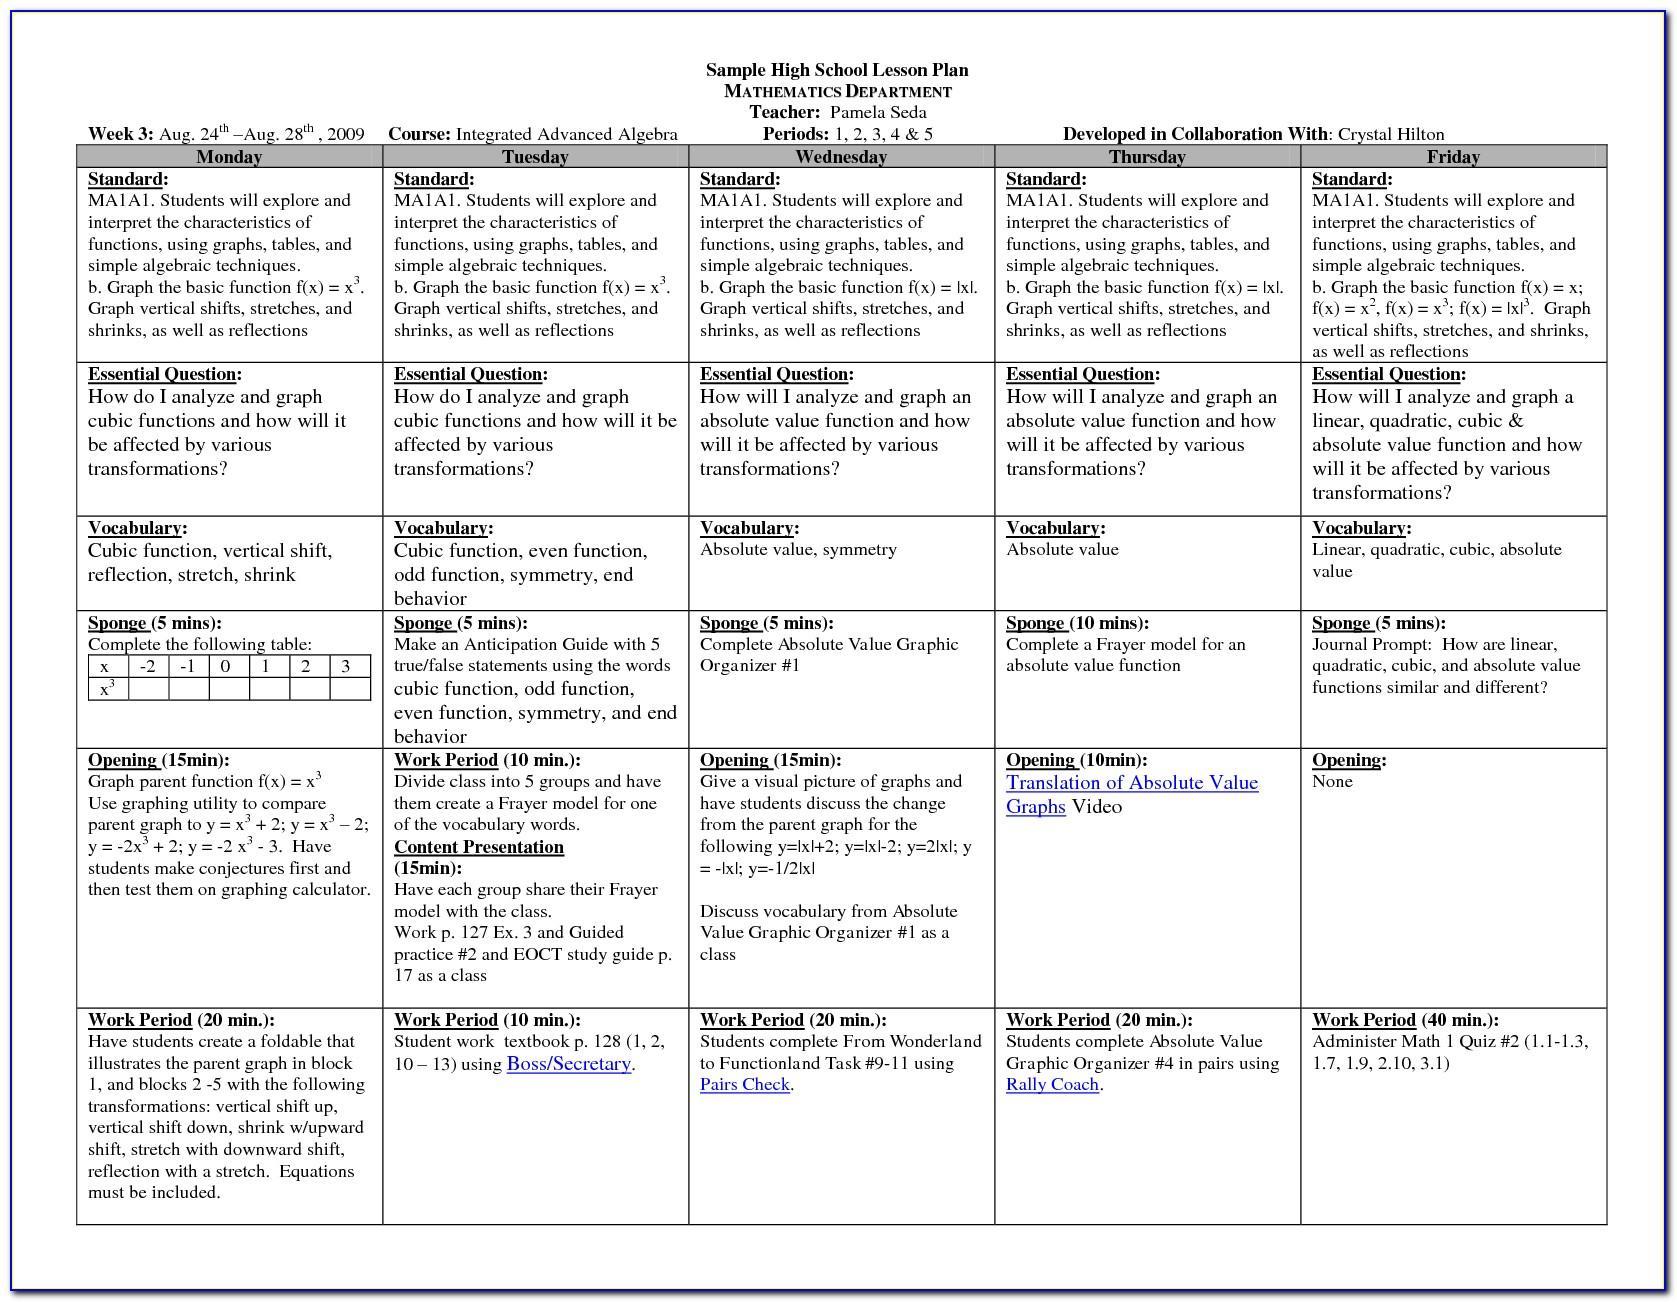 Lesson Plan Sample For High School Math